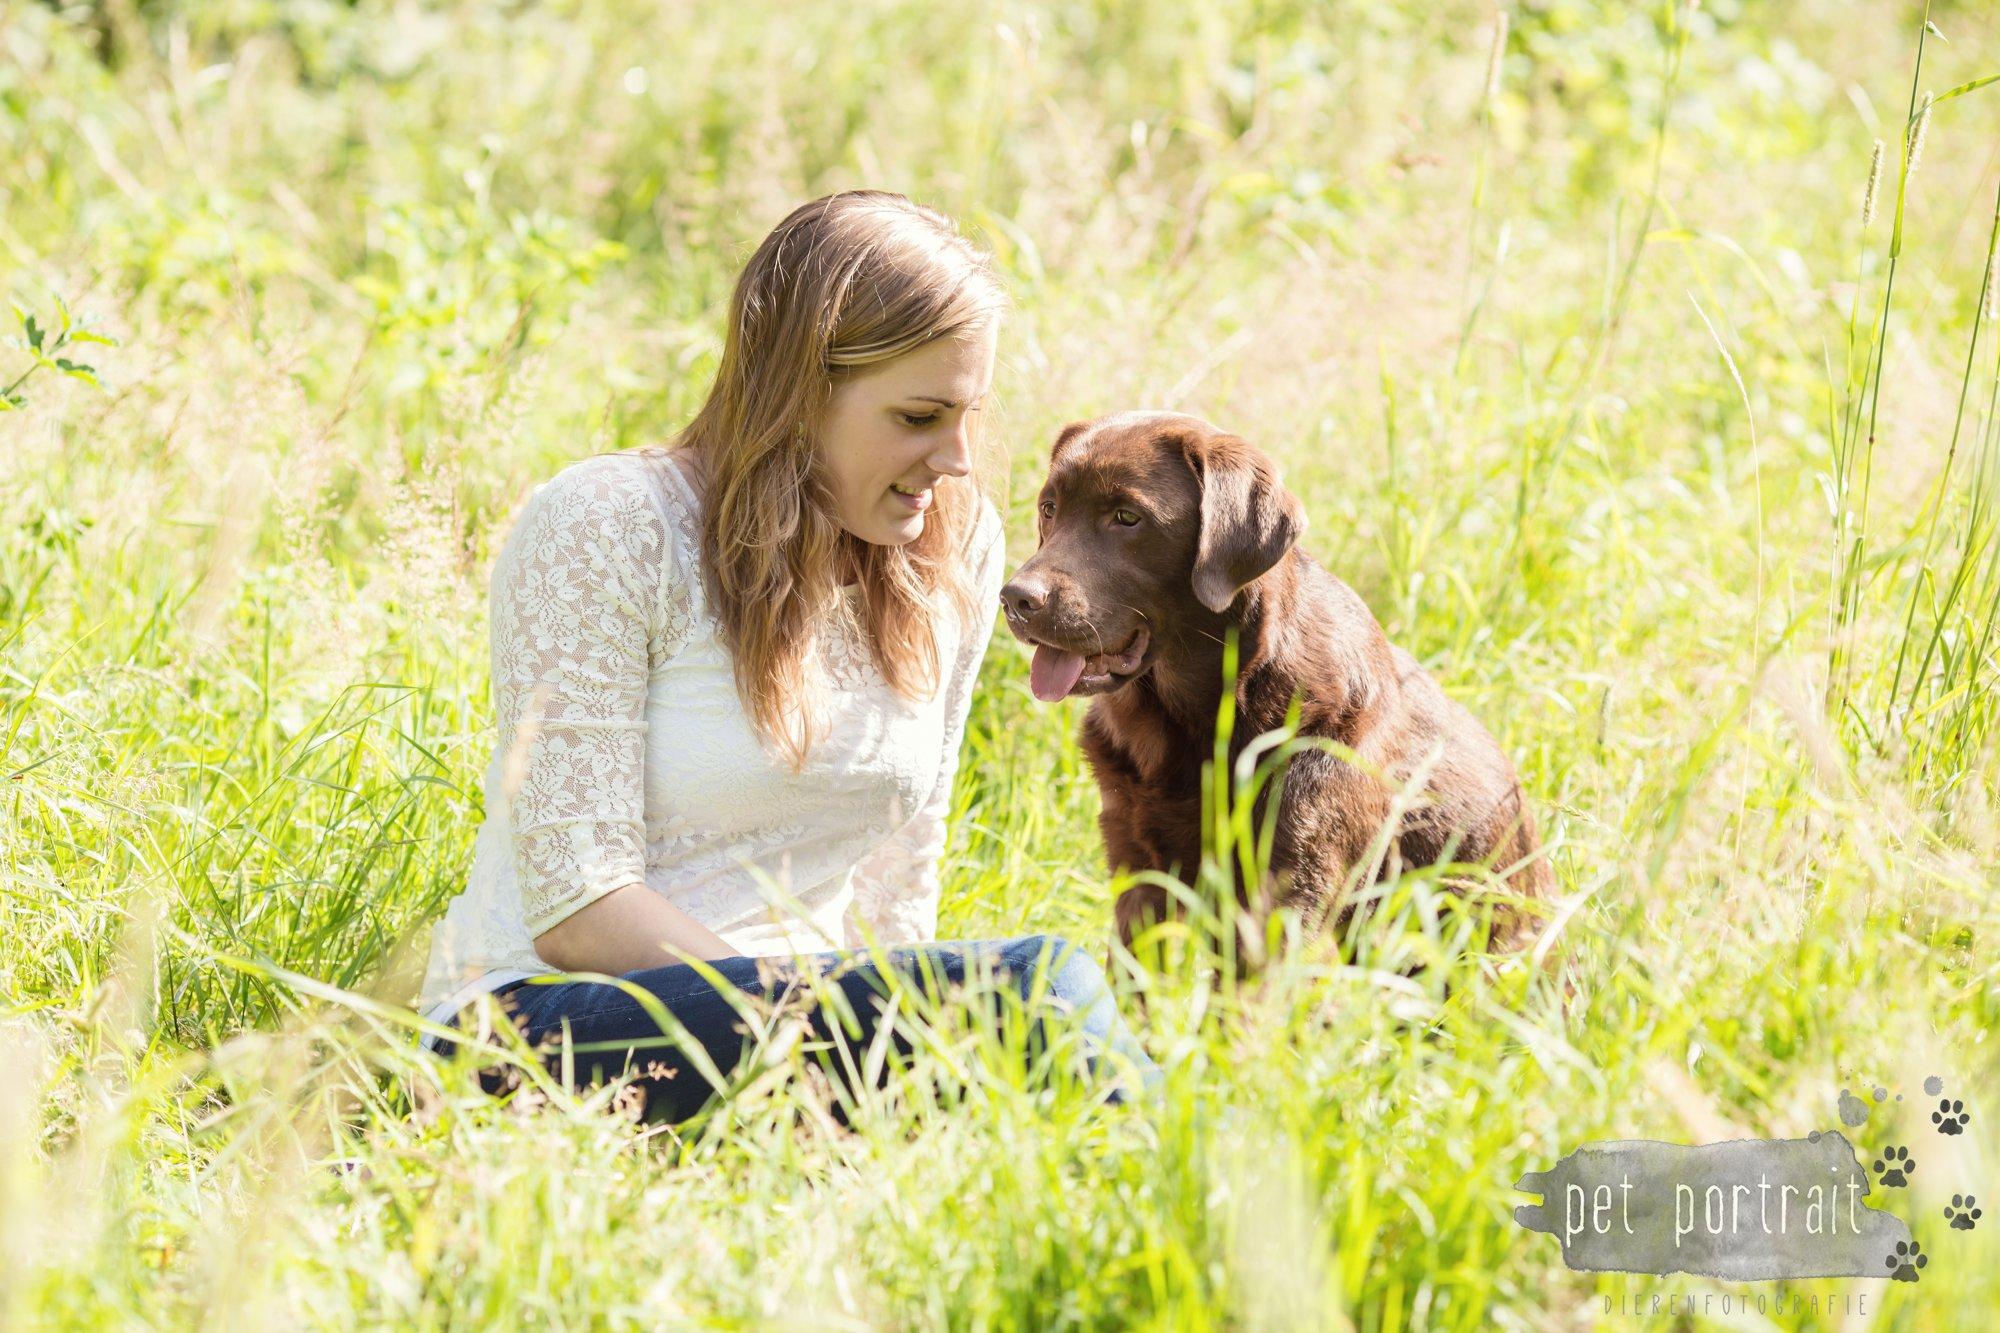 Hondenfotograaf Lelystad - Beloved Dier en Baasje fotoshoot-5